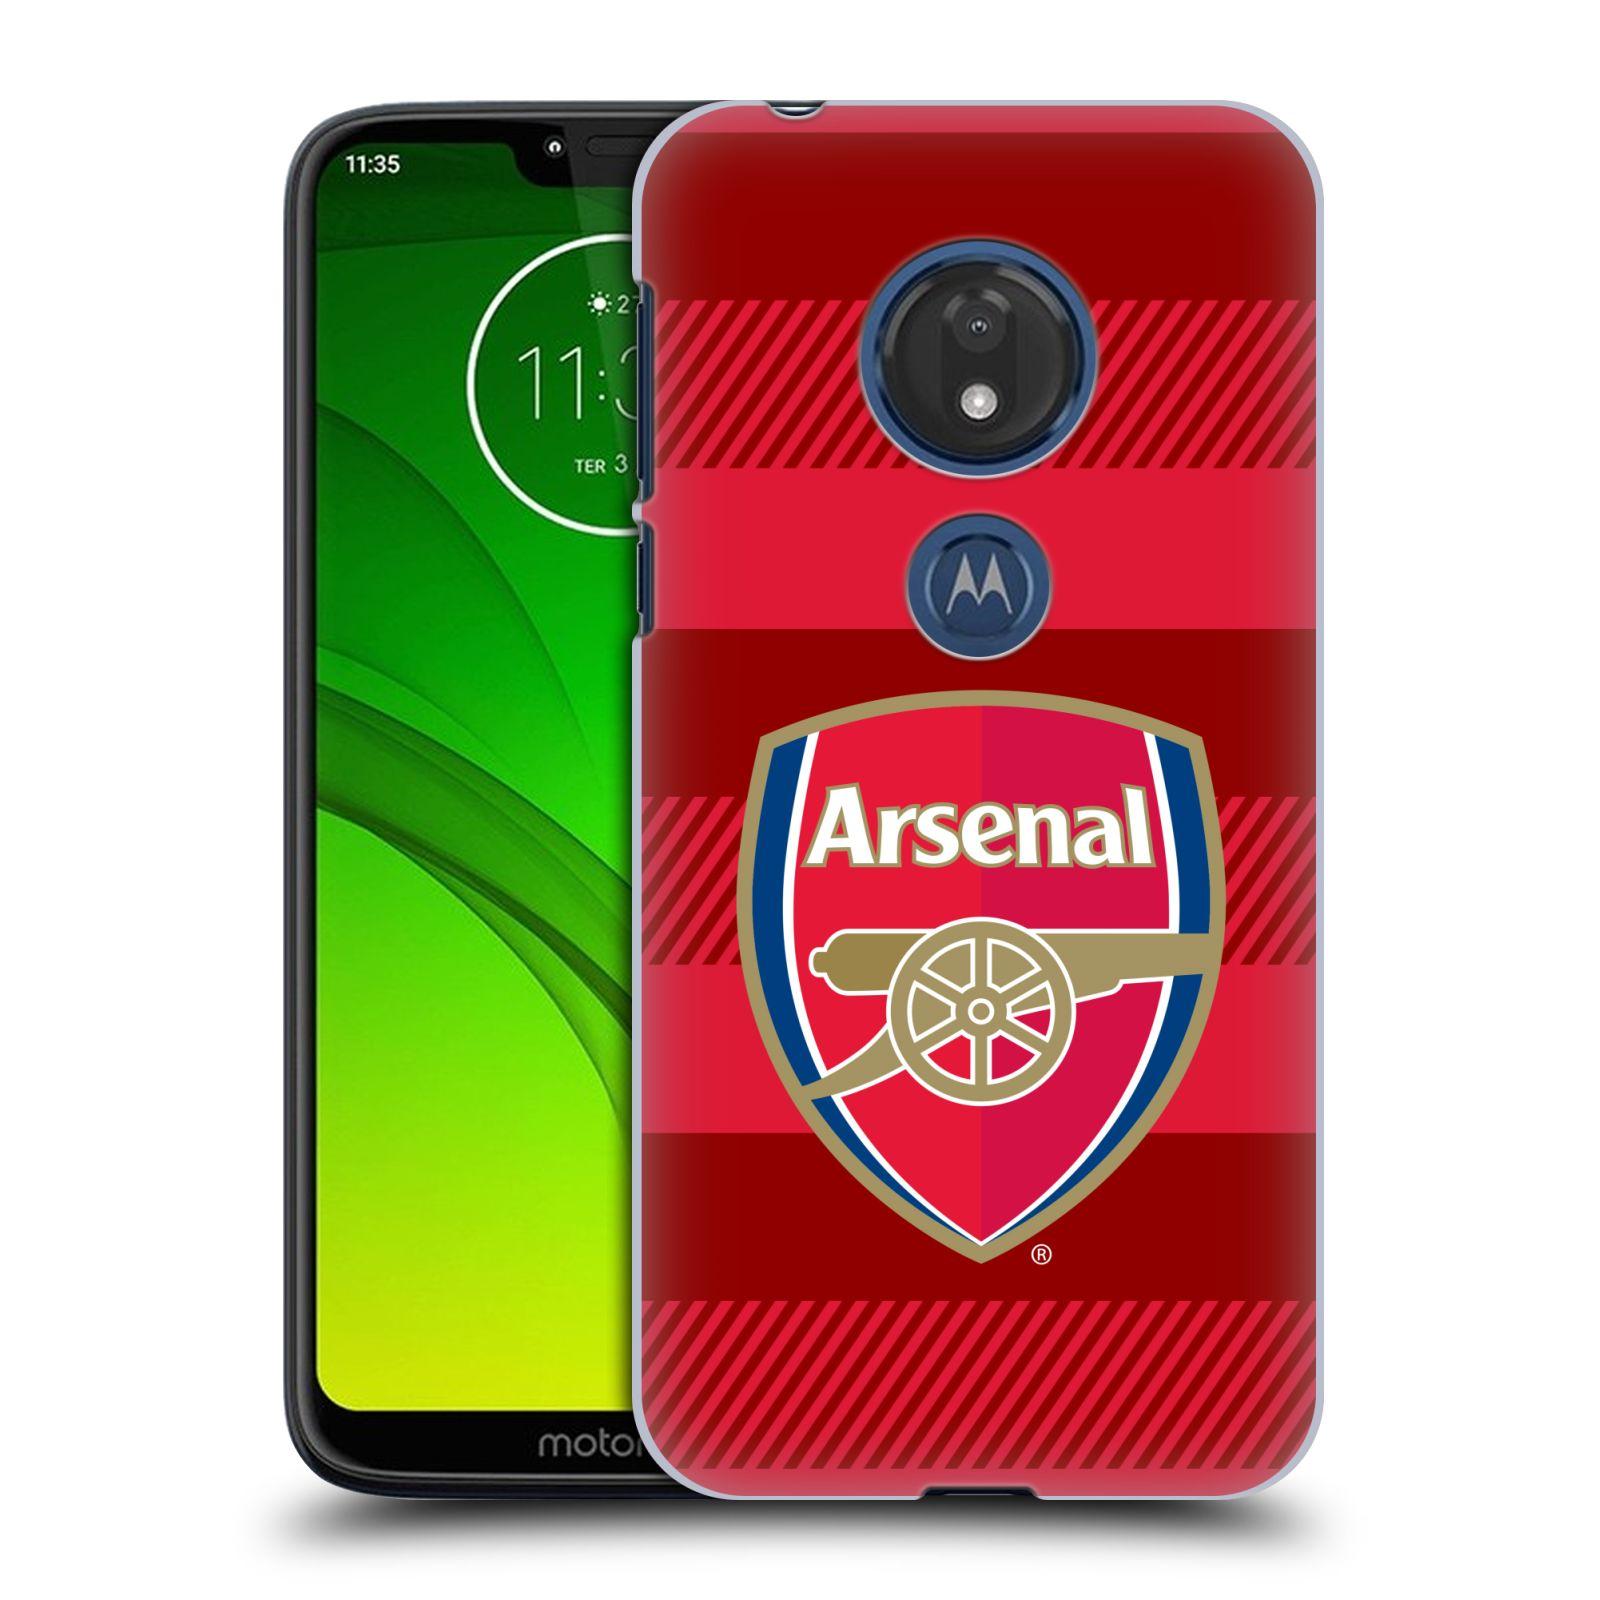 Plastové pouzdro na mobil Motorola Moto G7 Play - Head Case - Arsenal FC - Logo s pruhy